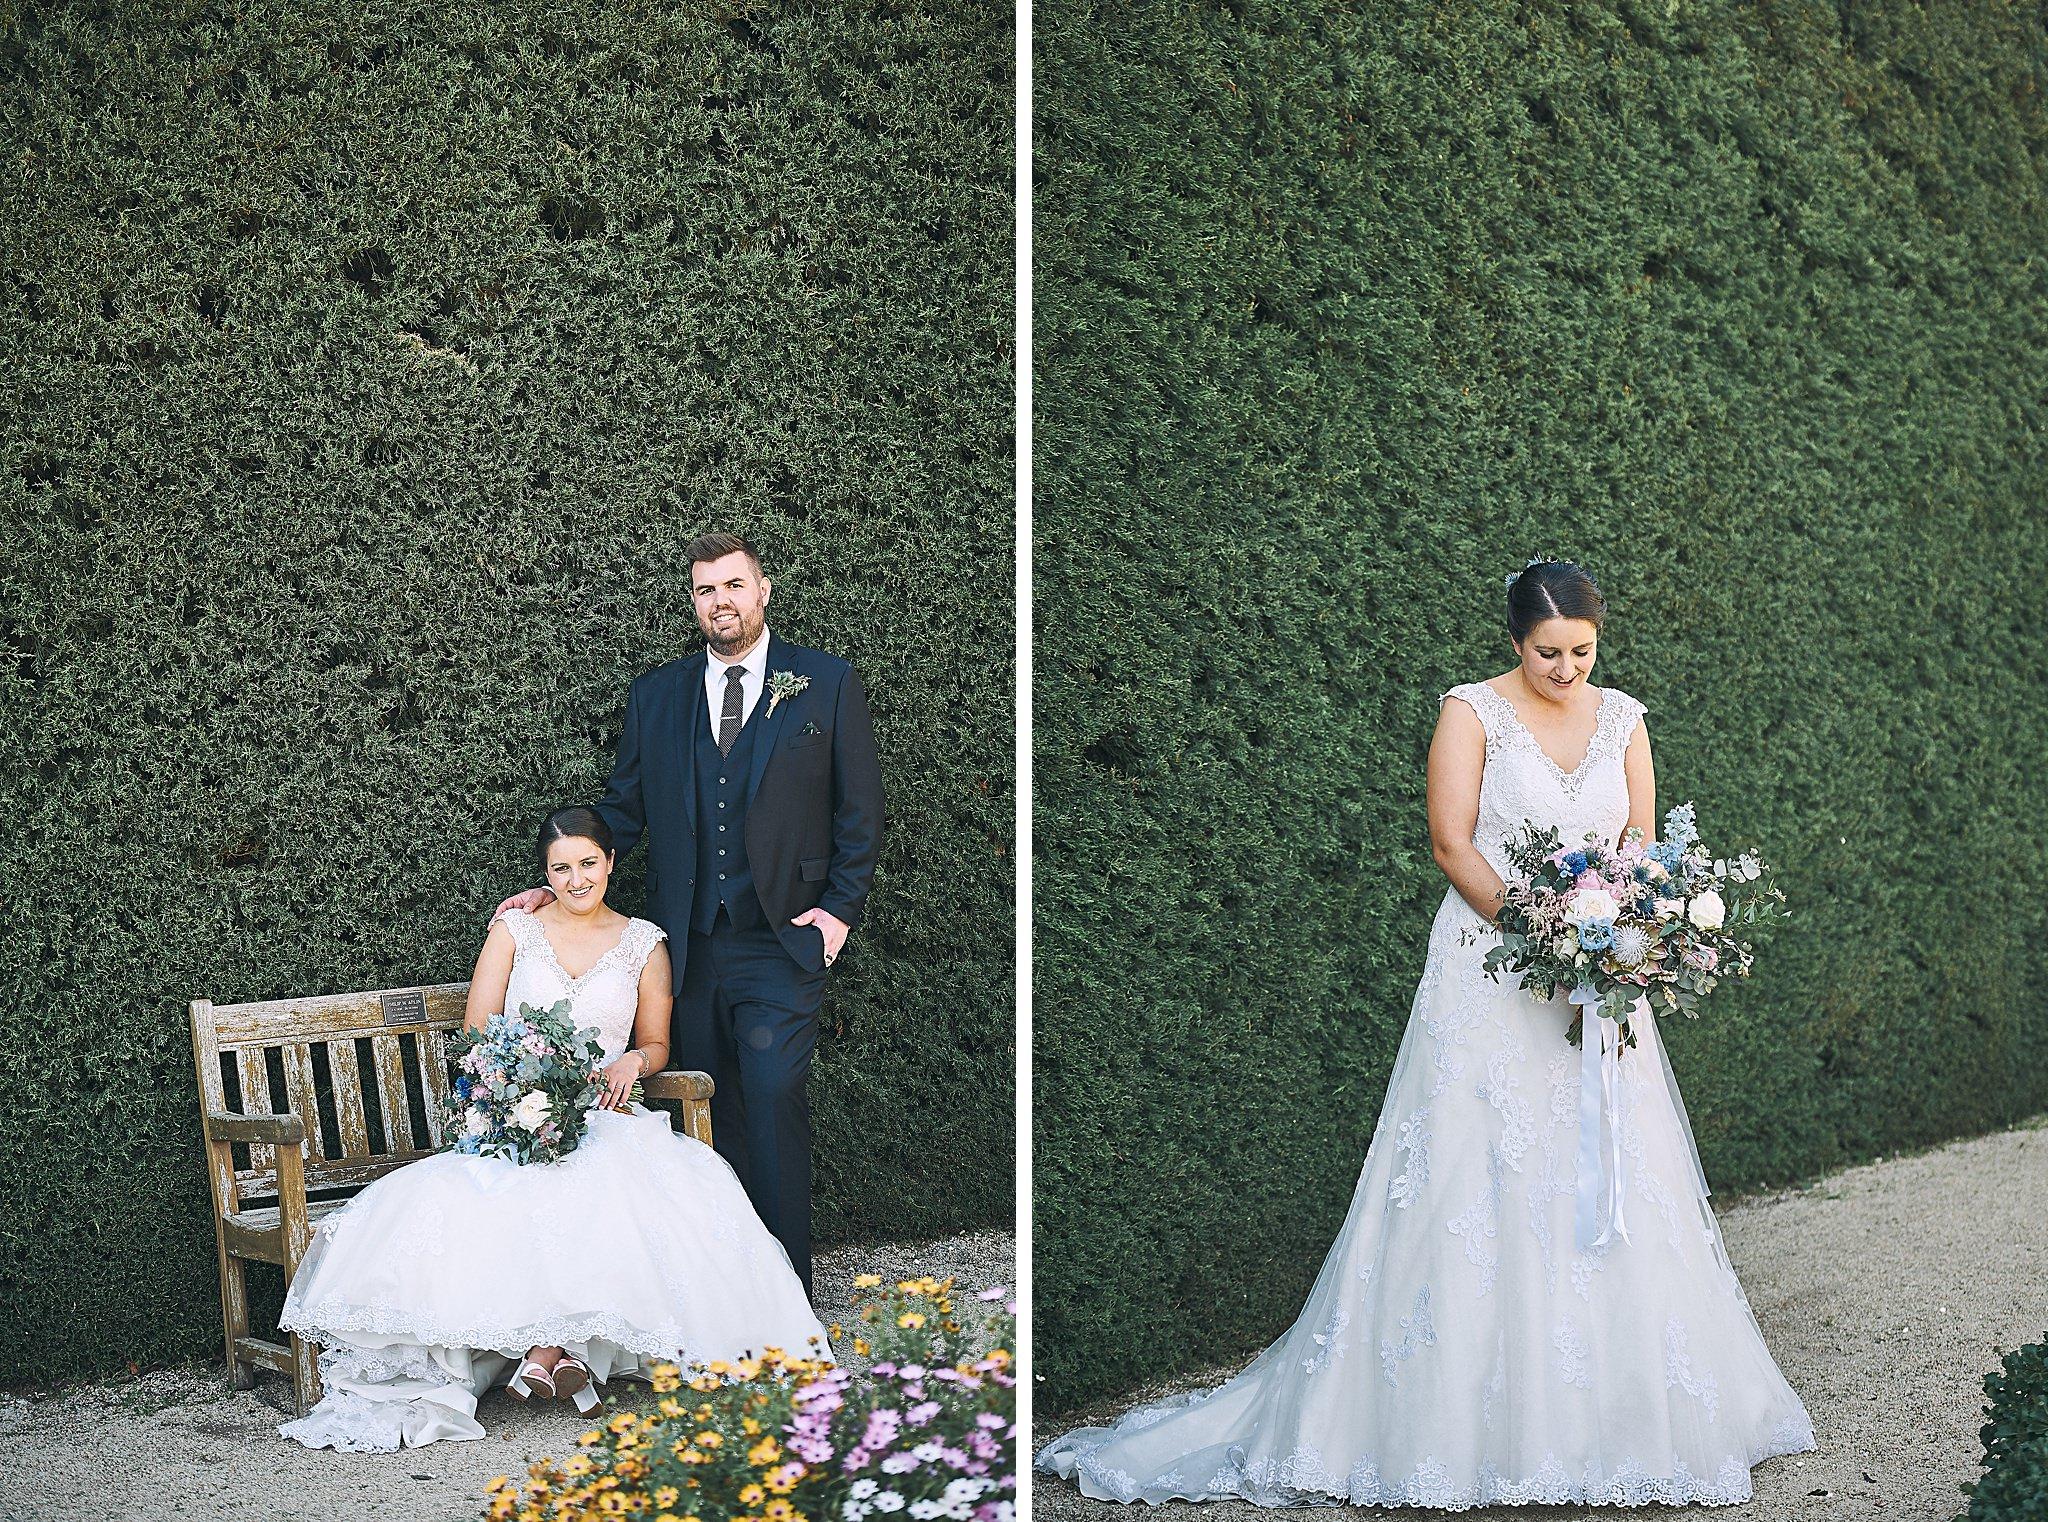 wedding_photographer_adelaide_0025.jpg